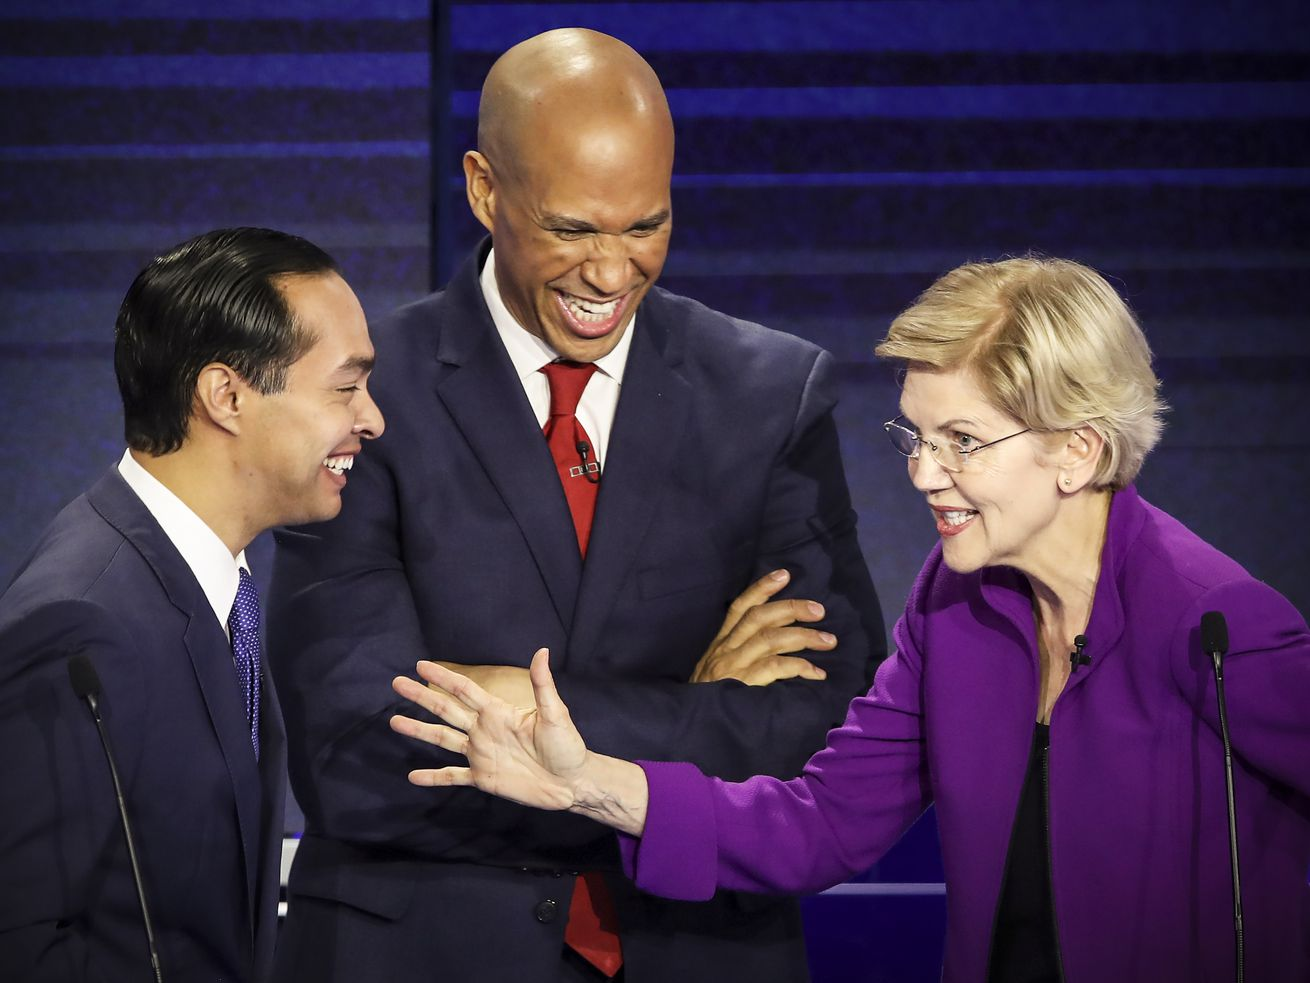 Former HUD Secretary Julián Castro, Sen. Cory Booker (D-NJ), and Sen. Elizabeth Warren (D-MA) during the first night of the Democratic presidential debate on June 26, 2019, in Miami.